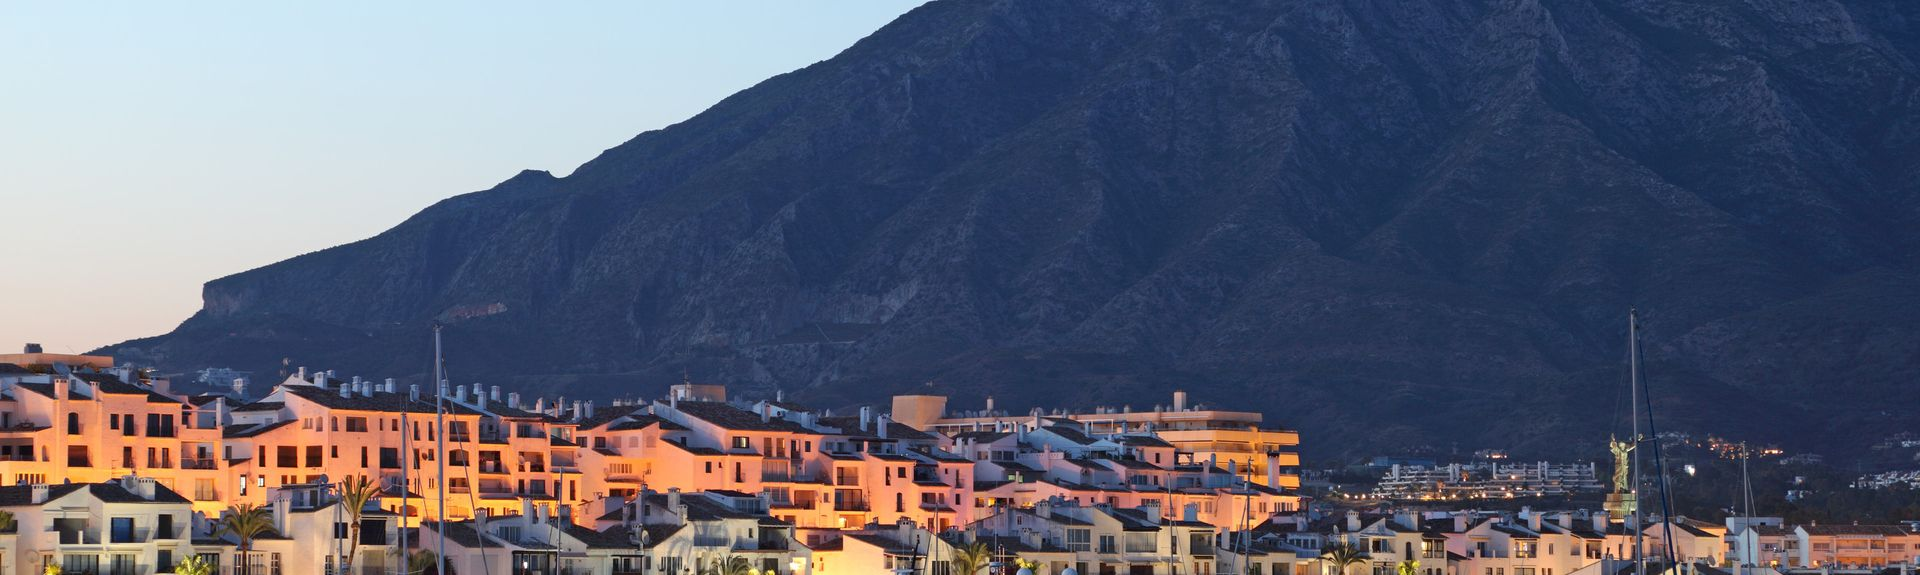 Plaża Puerto Banus, Marbella, Andaluzja, Hiszpania